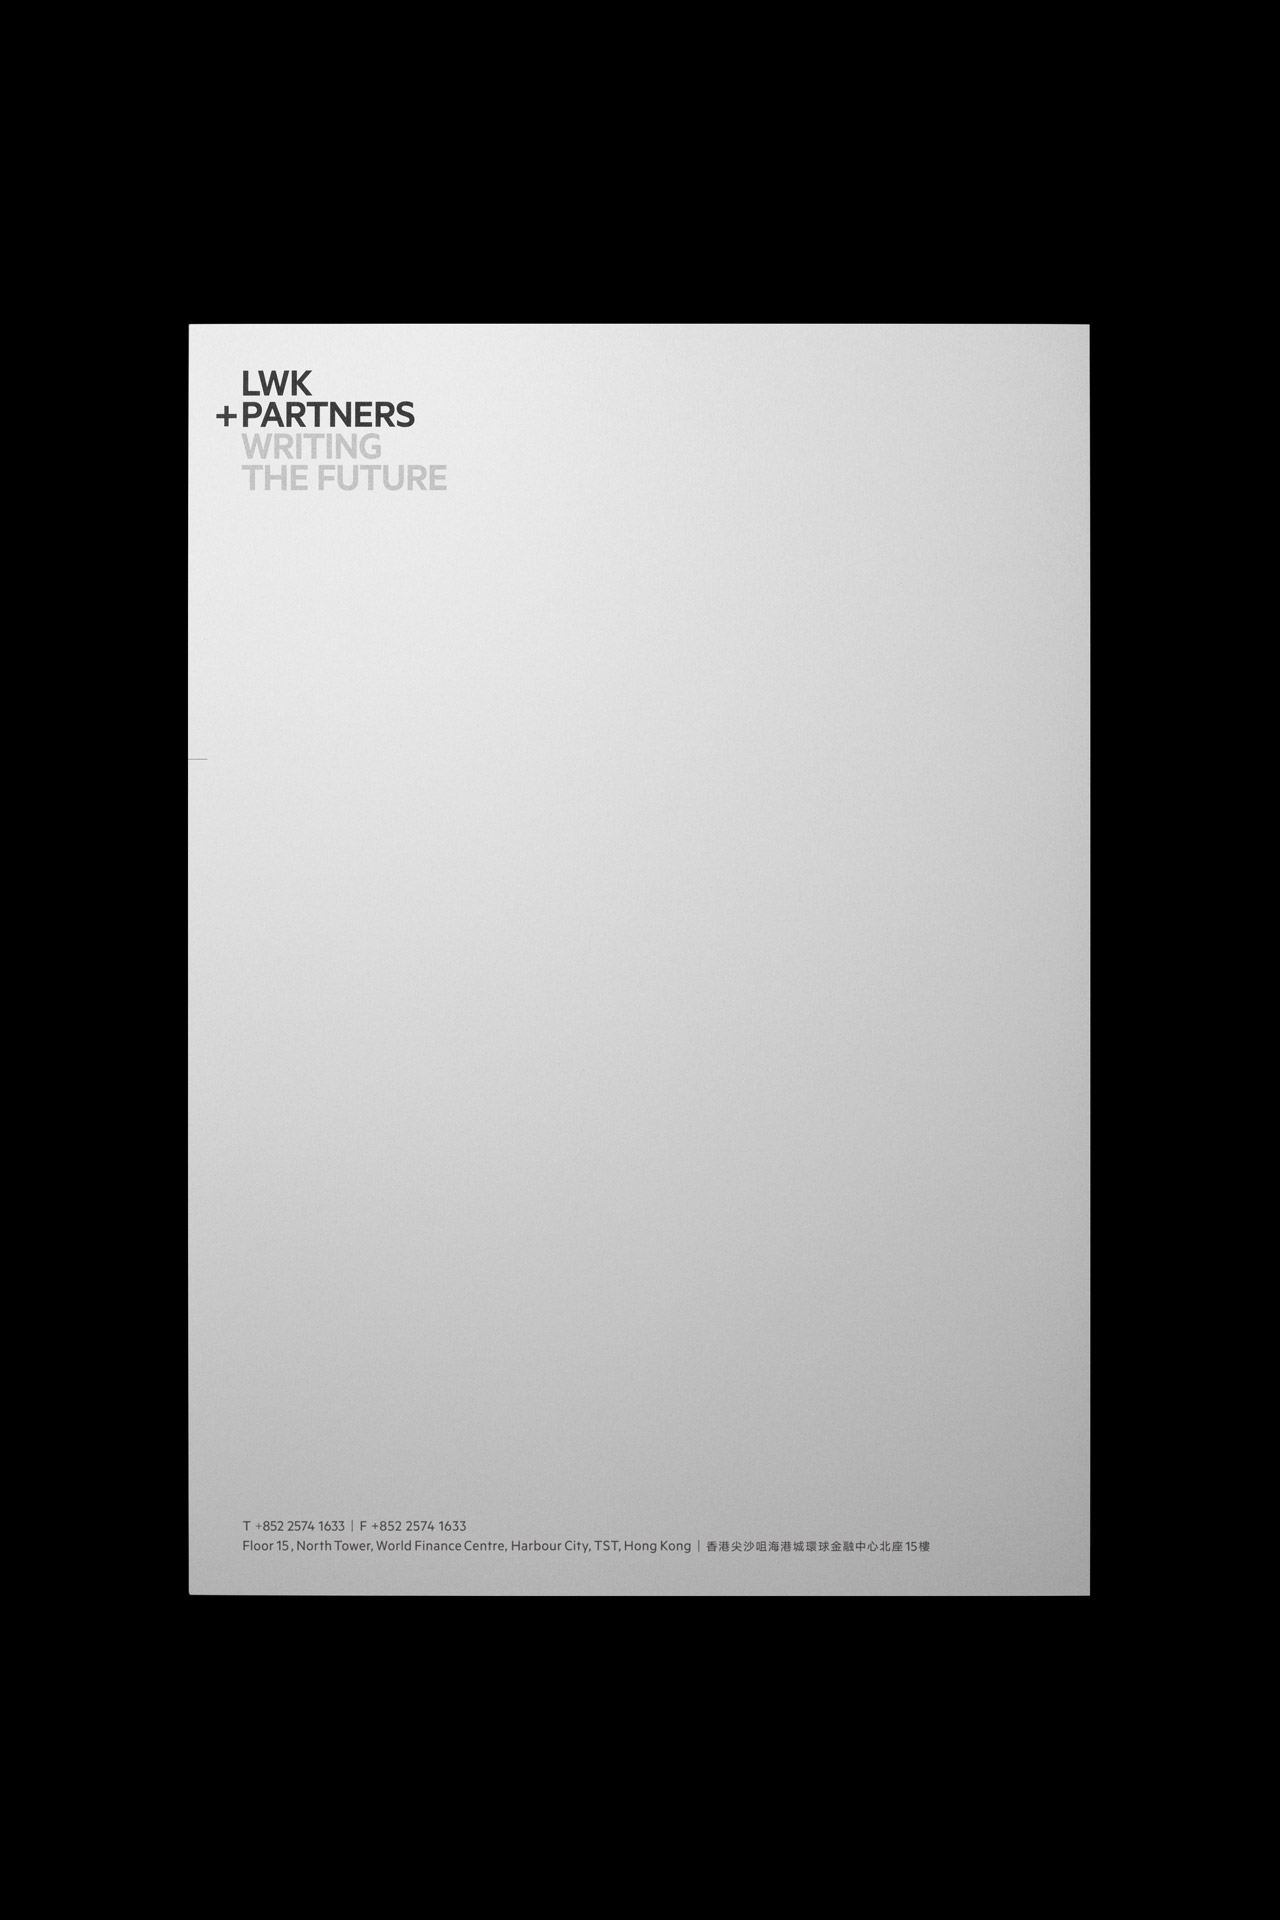 lwk-partners_05